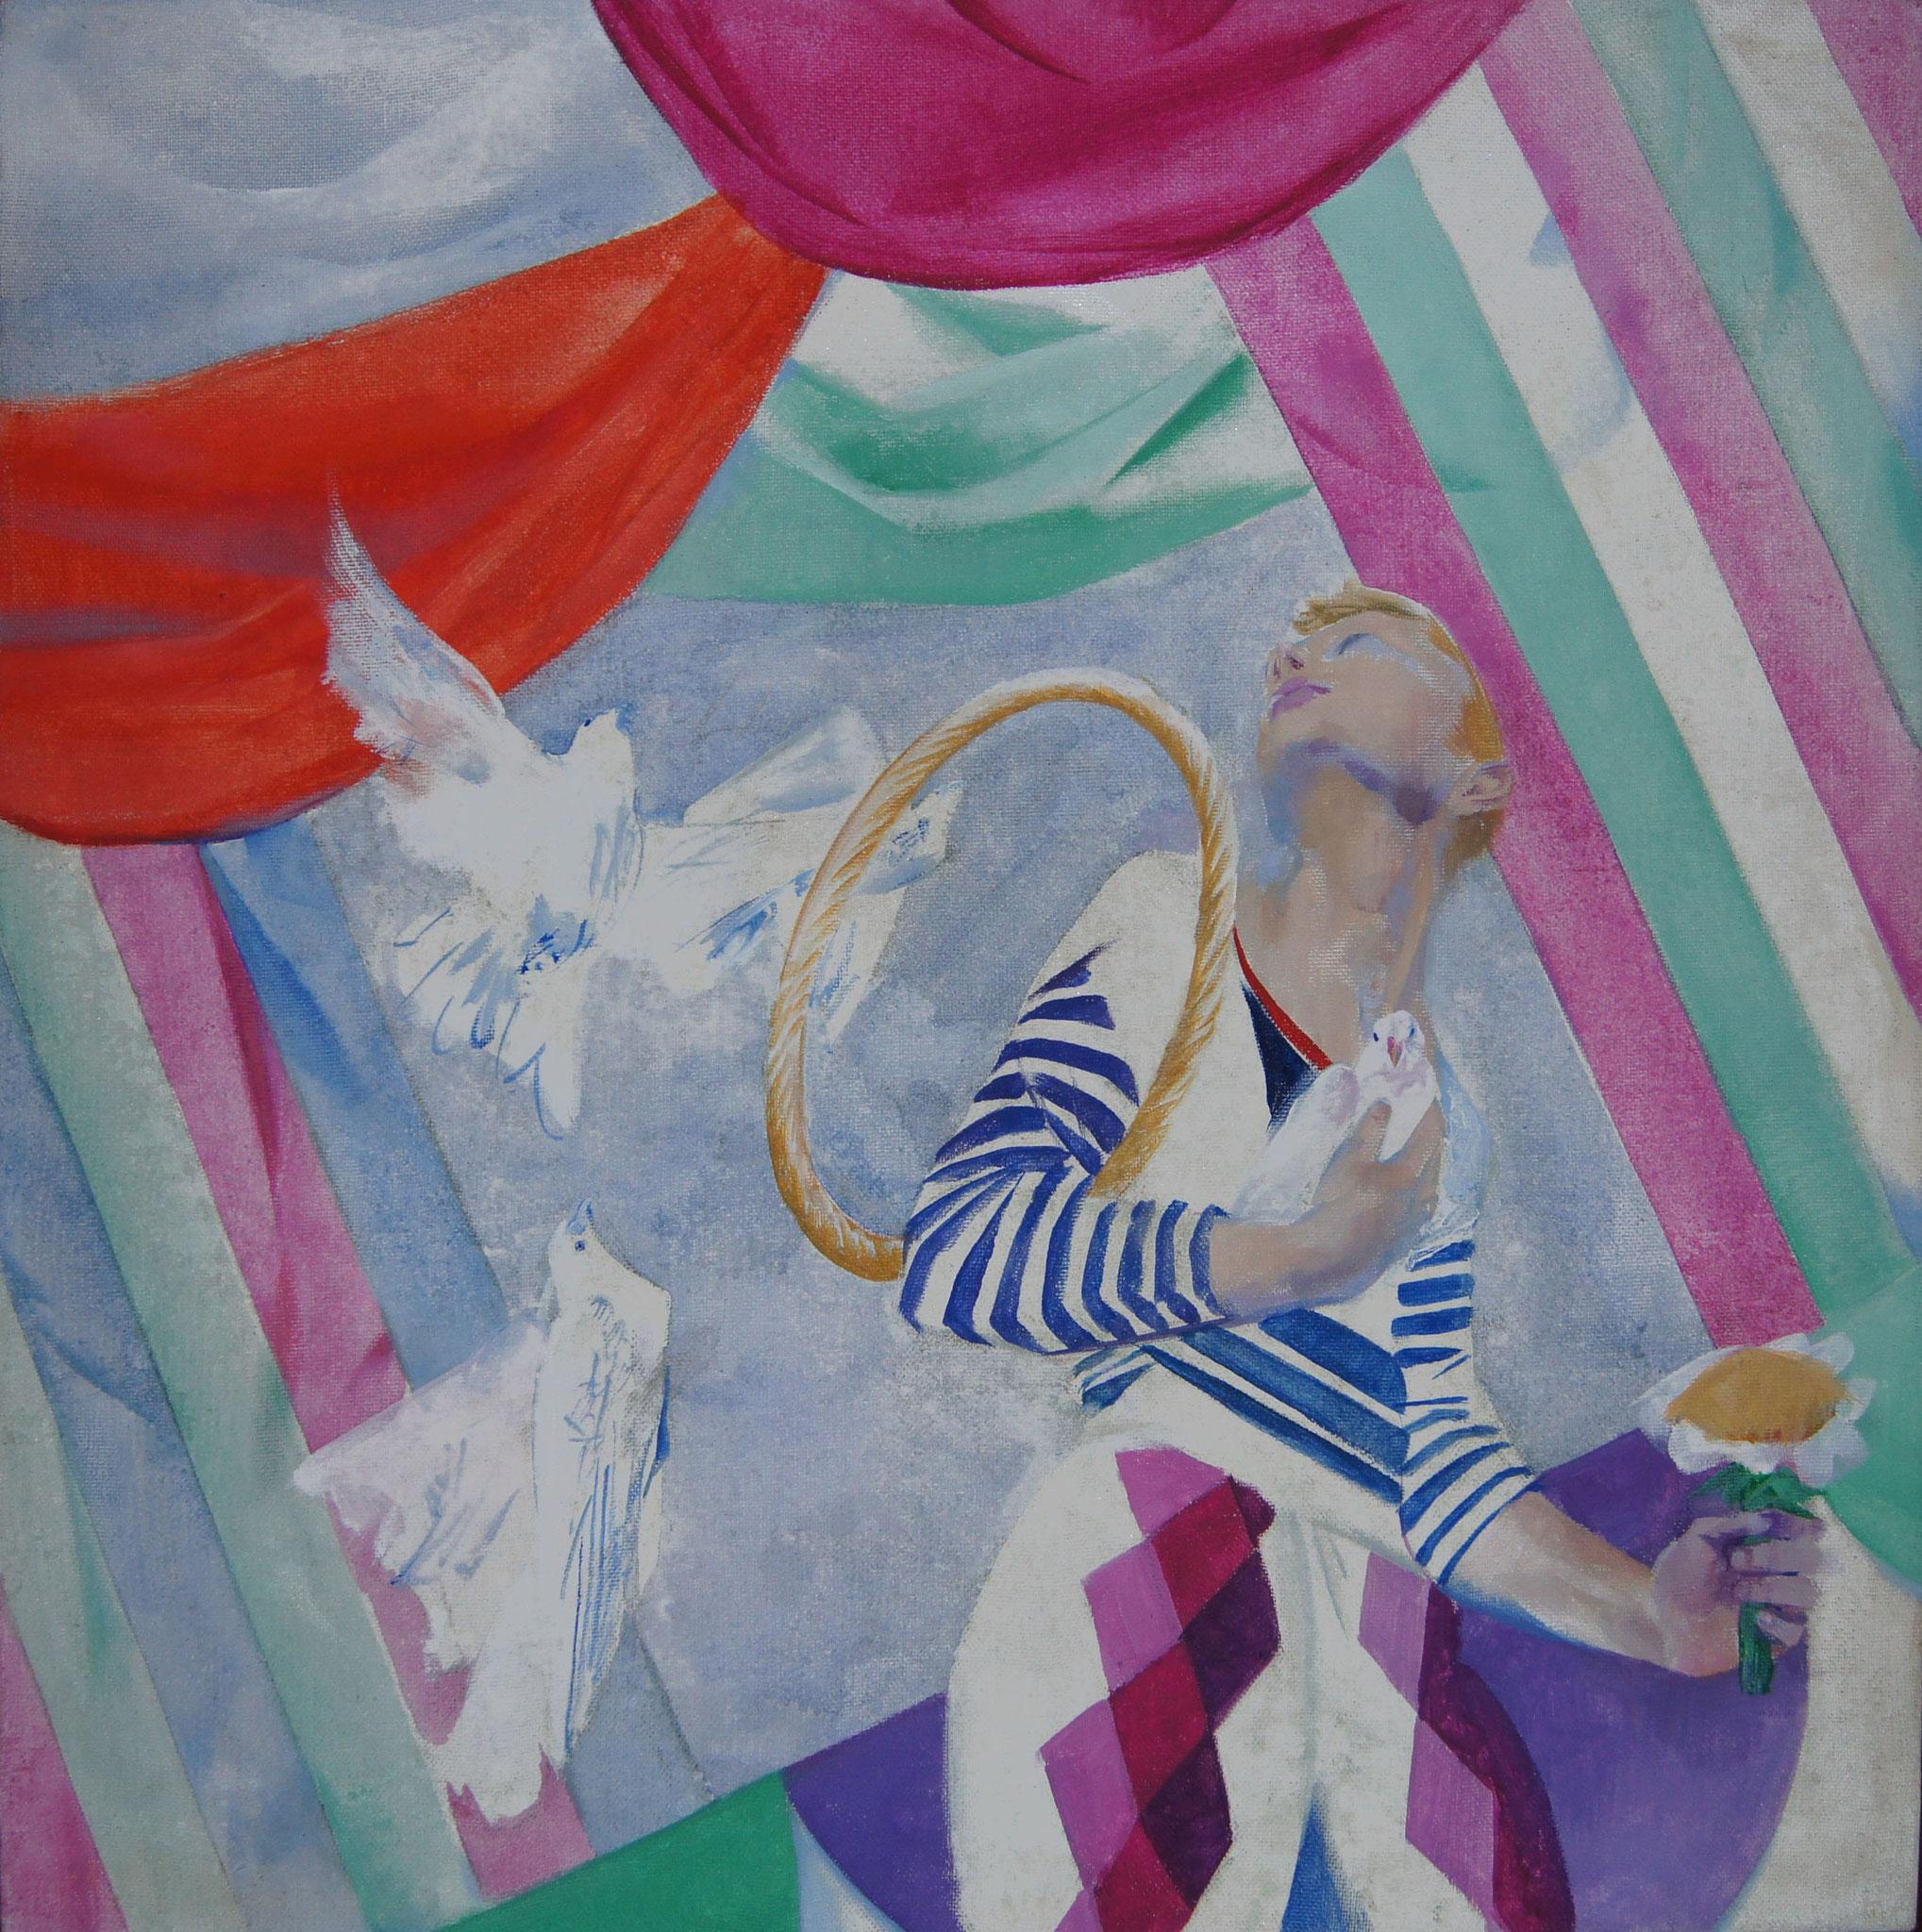 Люся Краскова       Номер с голубями.      2016 г.     60х60 см.        Холст, масло.